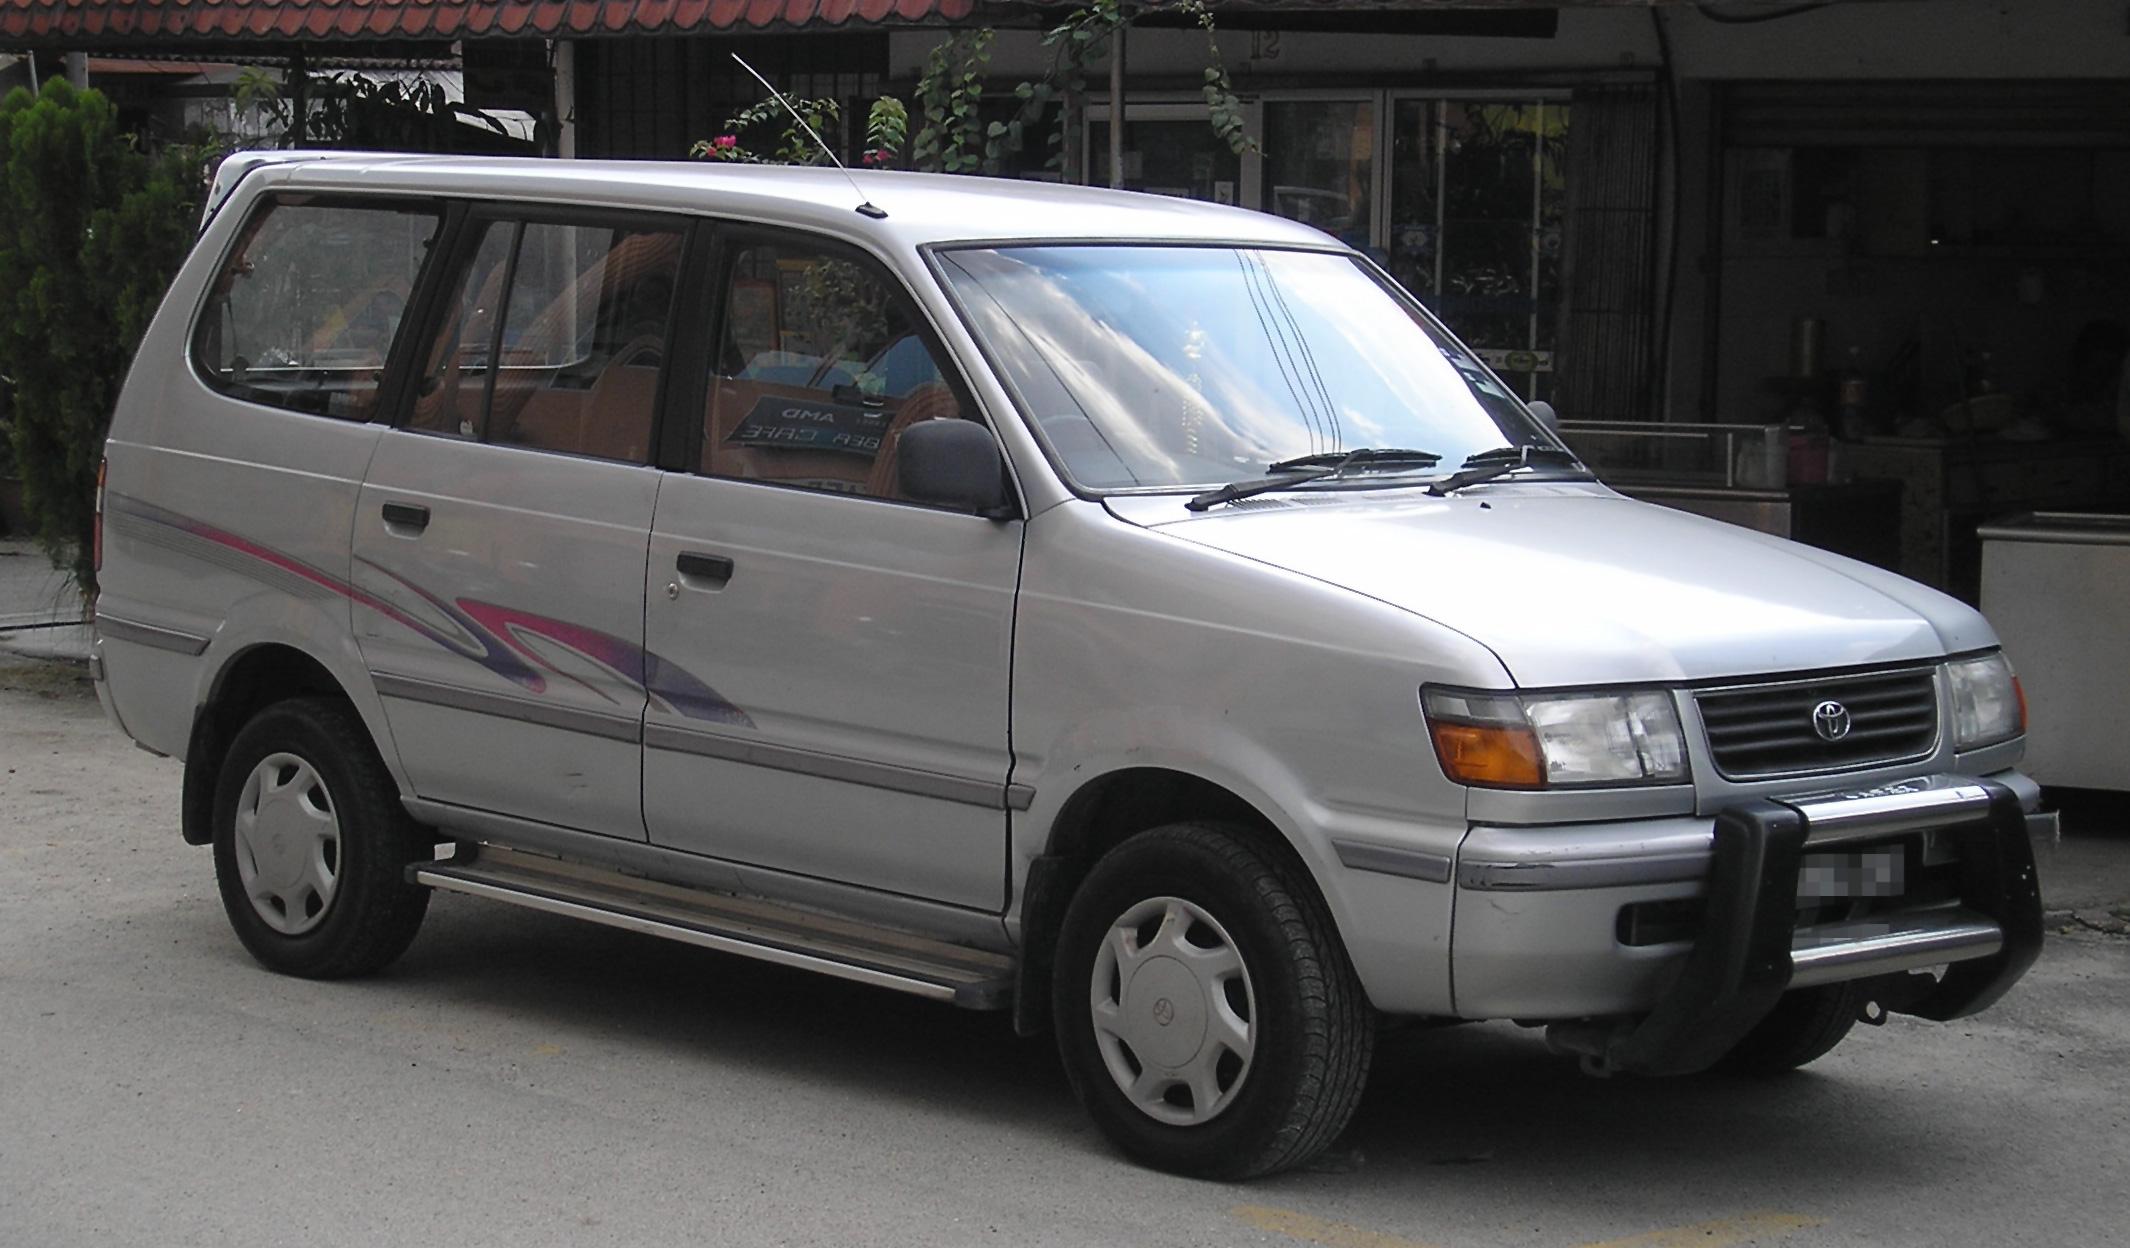 Datei:Toyota Unser (fifth generation) (front), Kajang.jpg